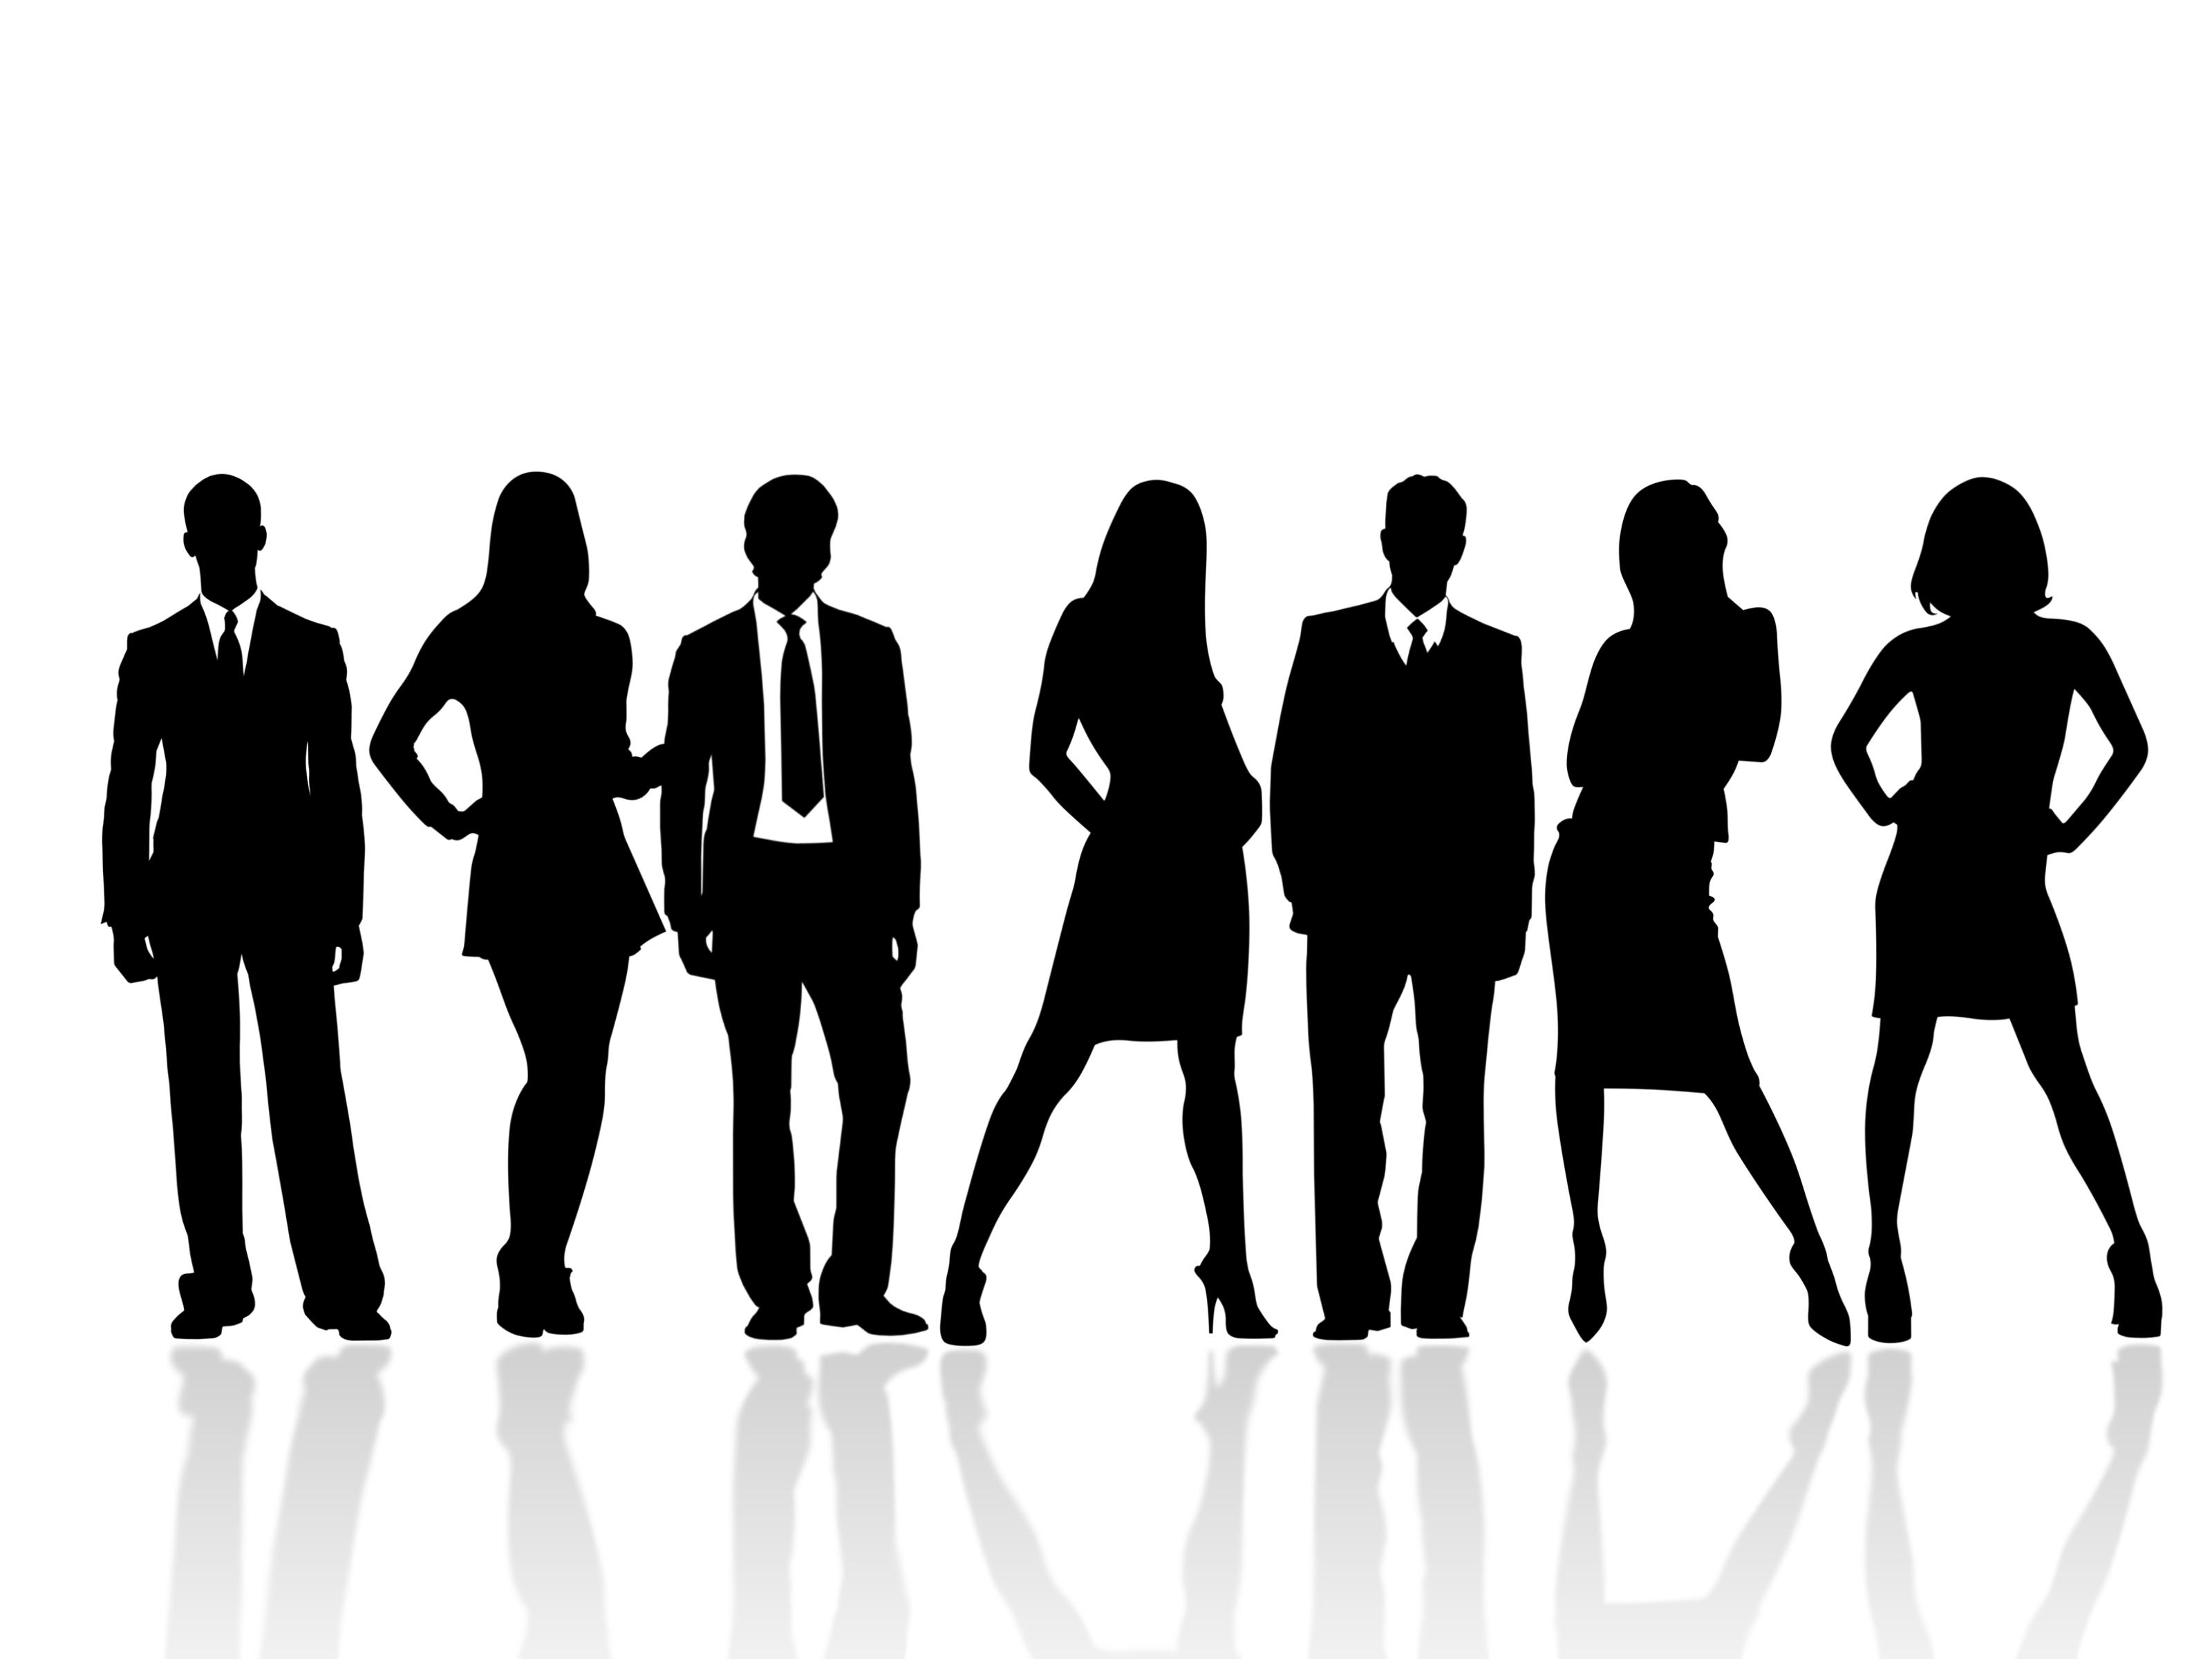 Professional clipart buisness. Business portal